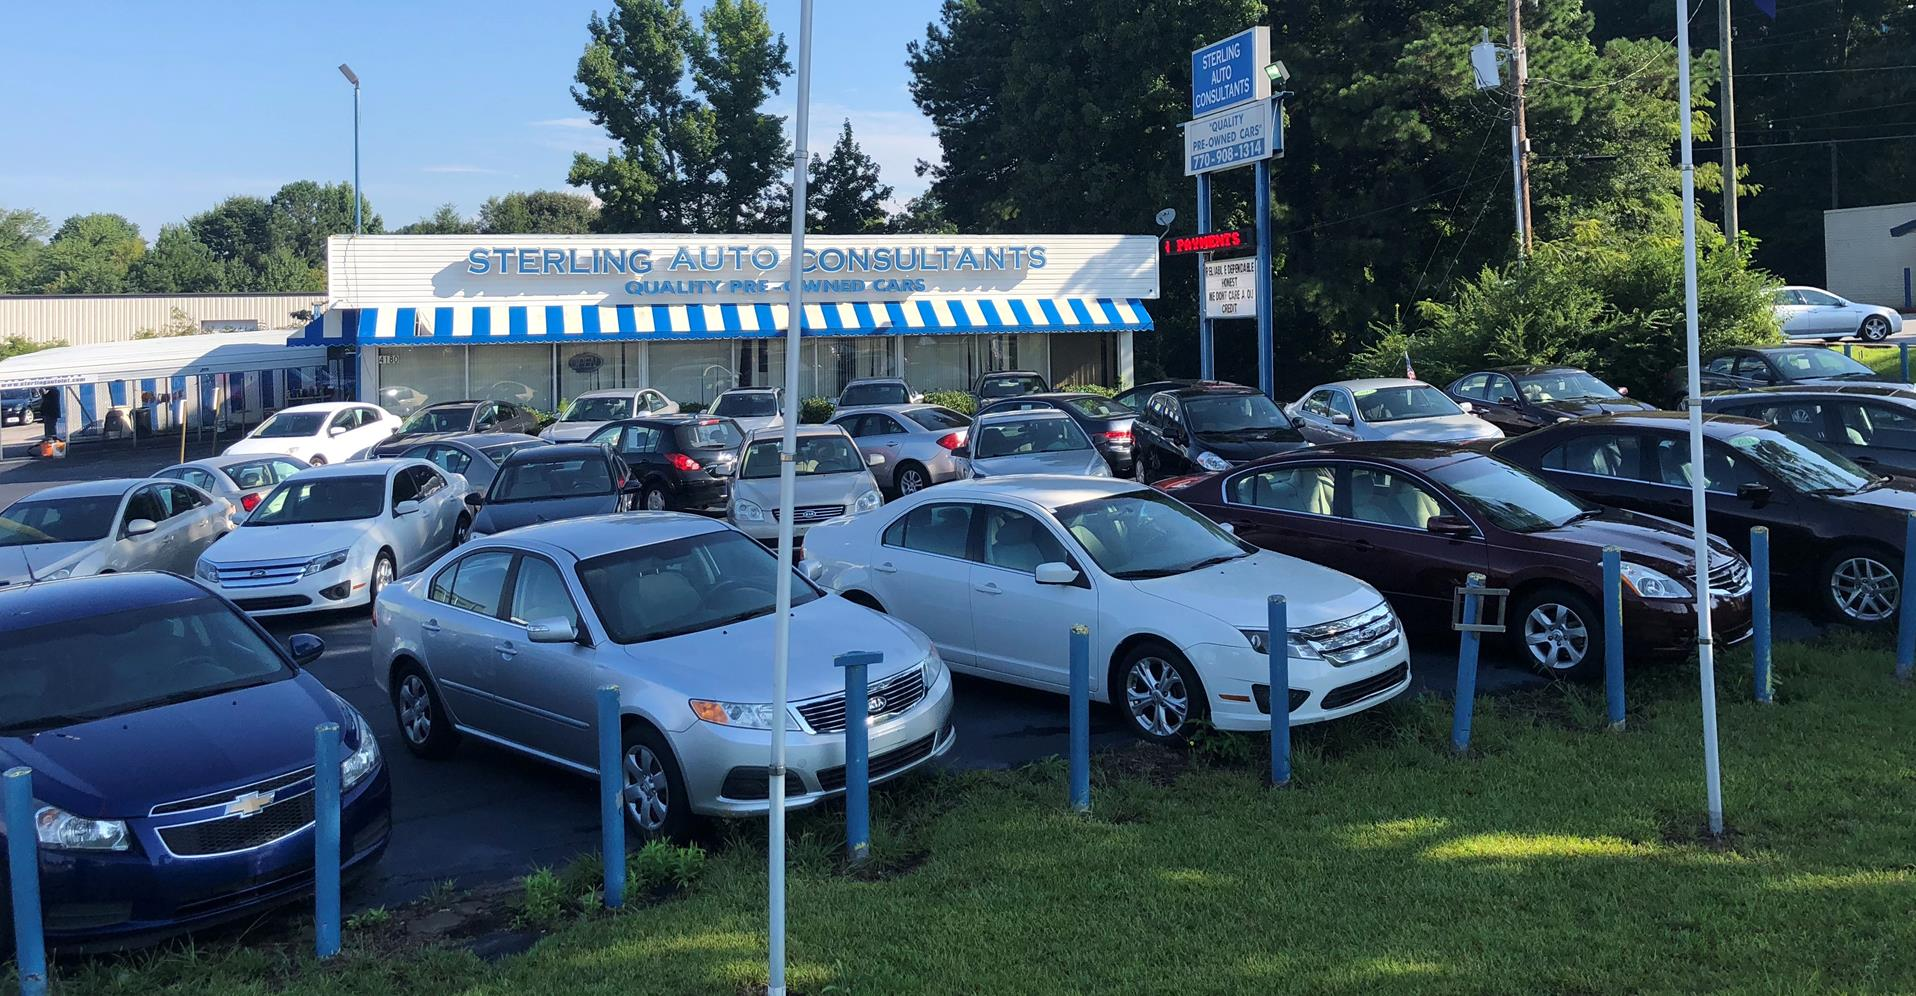 Volvo Cars Mall Of Geia Buford Ga 30519